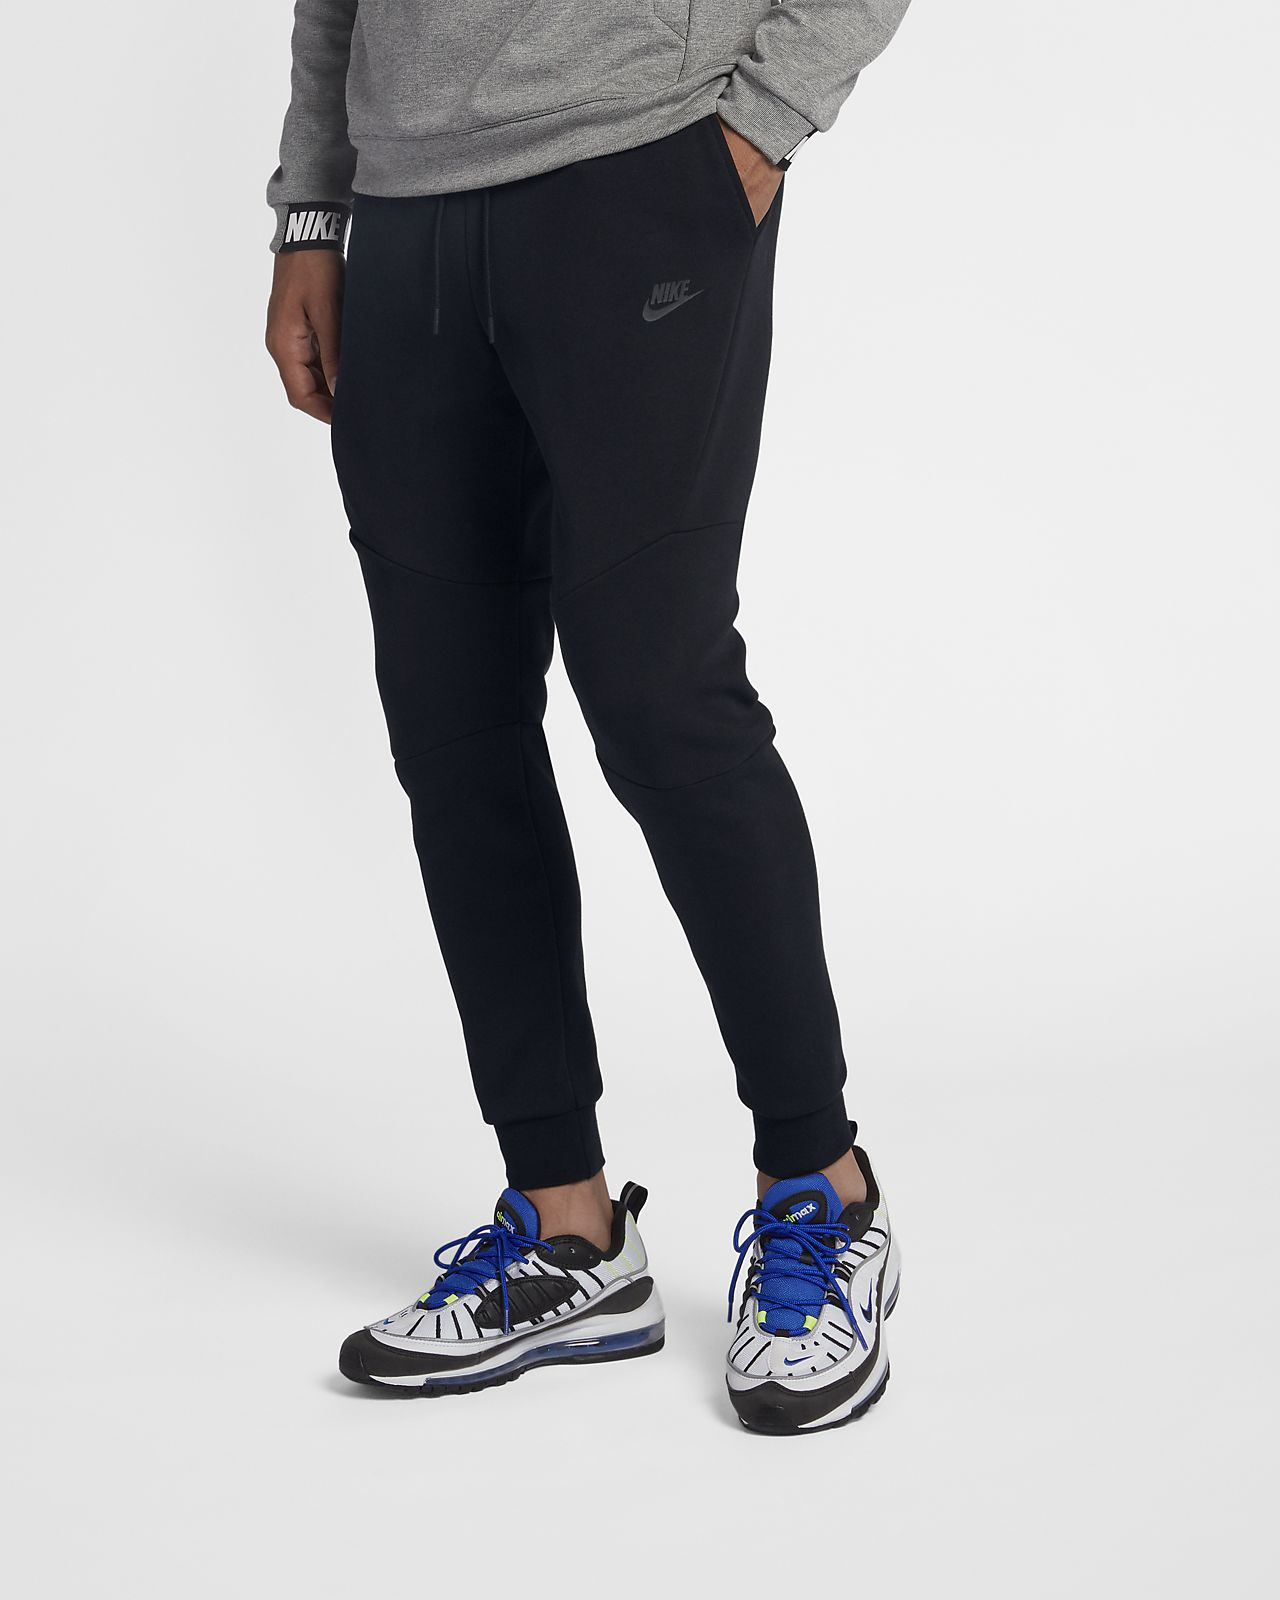 scarpe nike joggers uomo